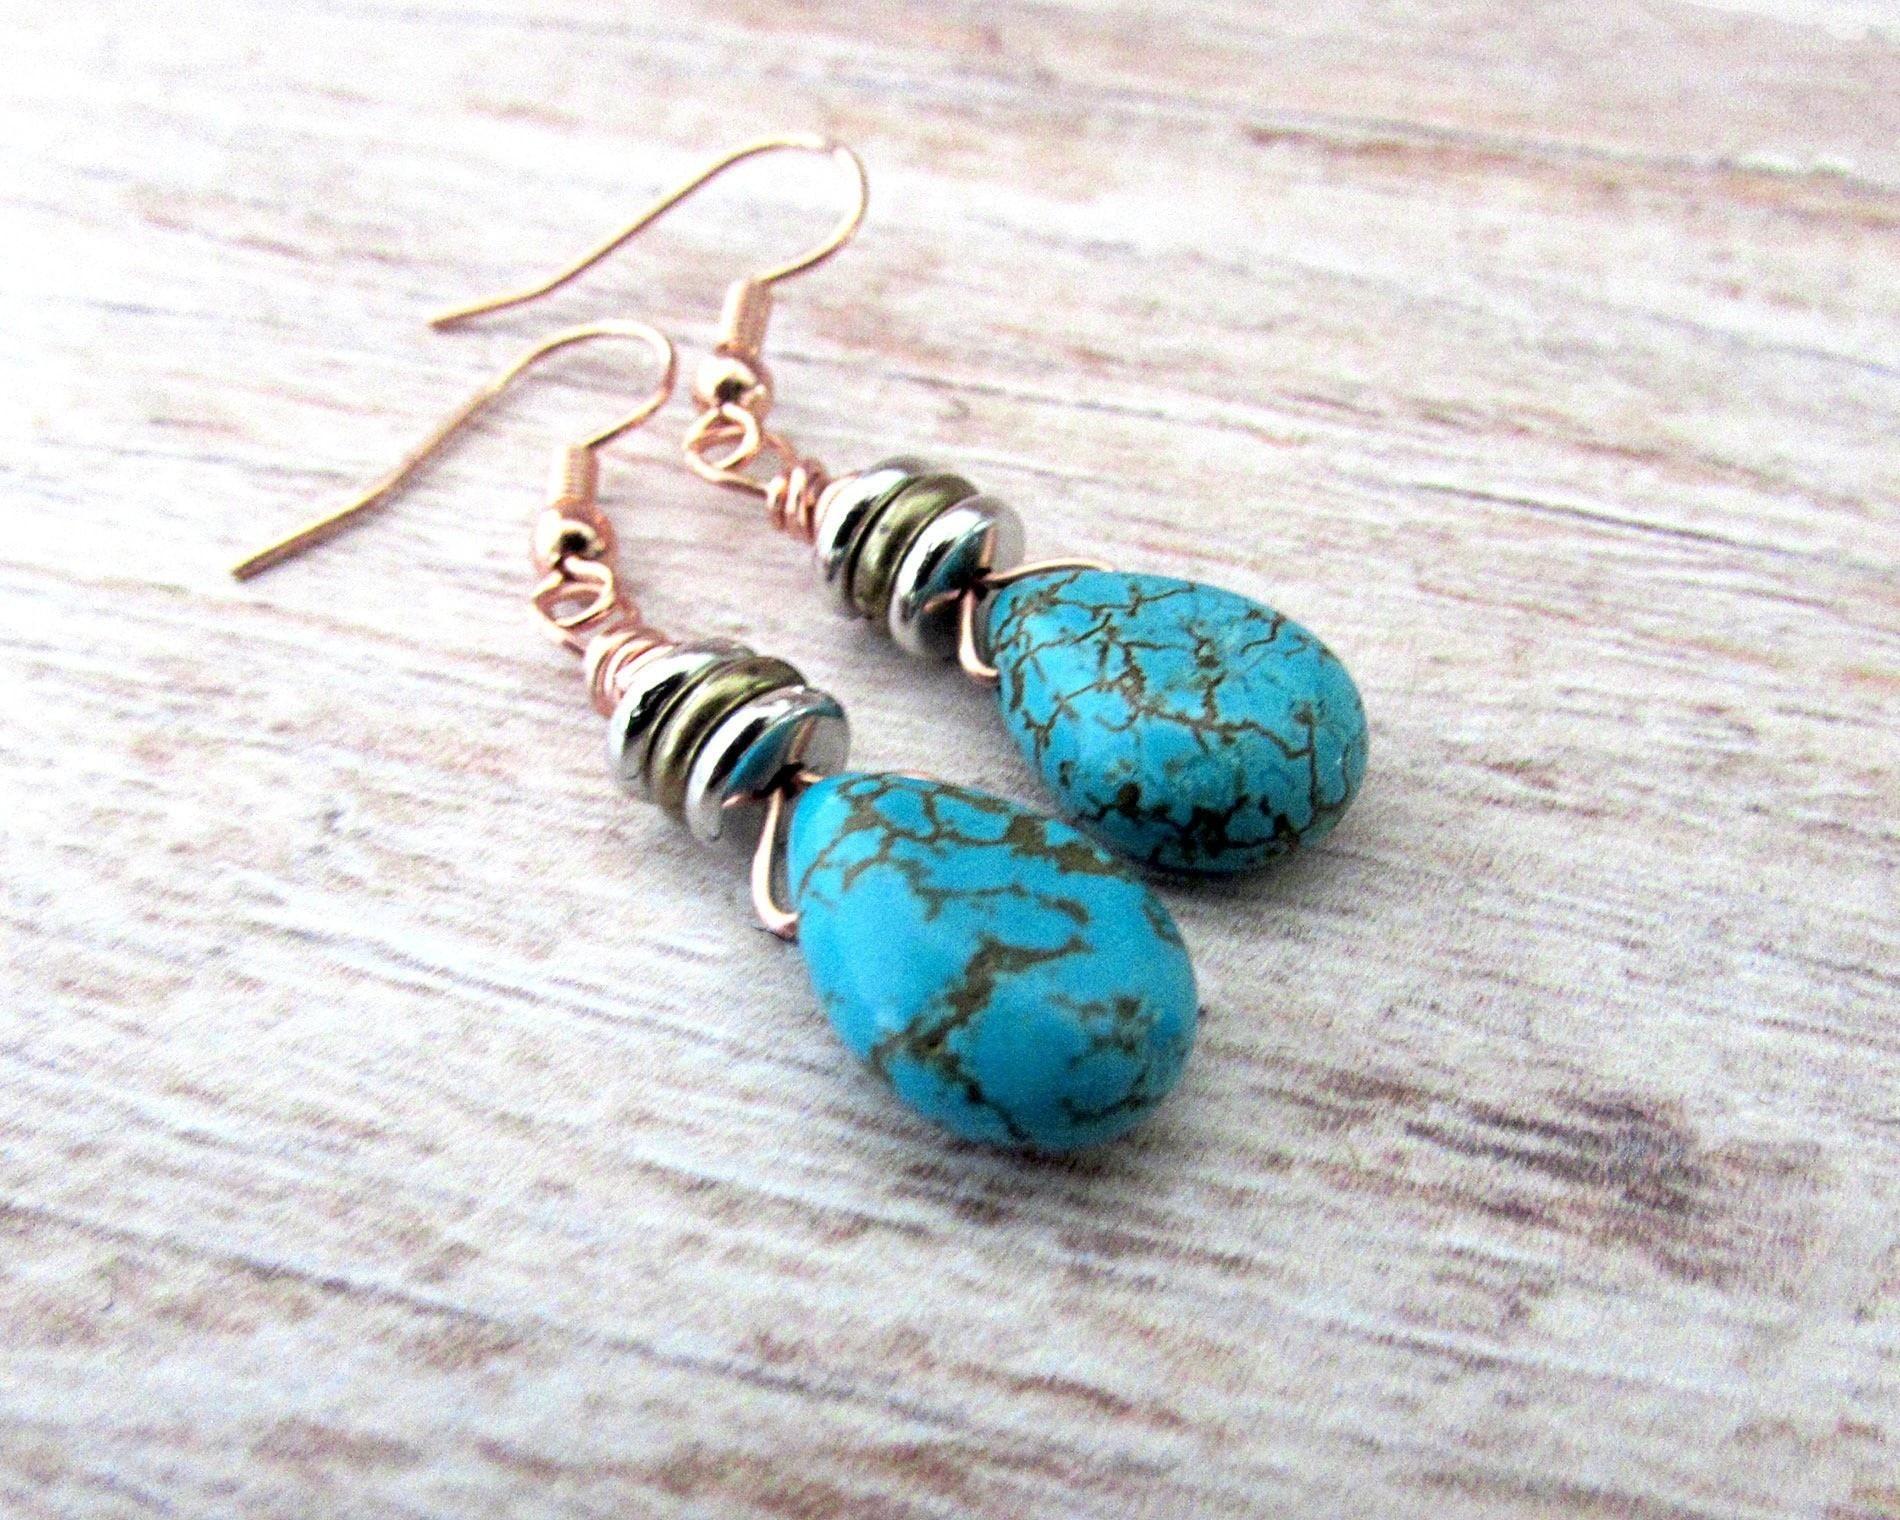 Diy Boho Turquoise Earrings · How To Make A Dangle Earring · Jewelry ...